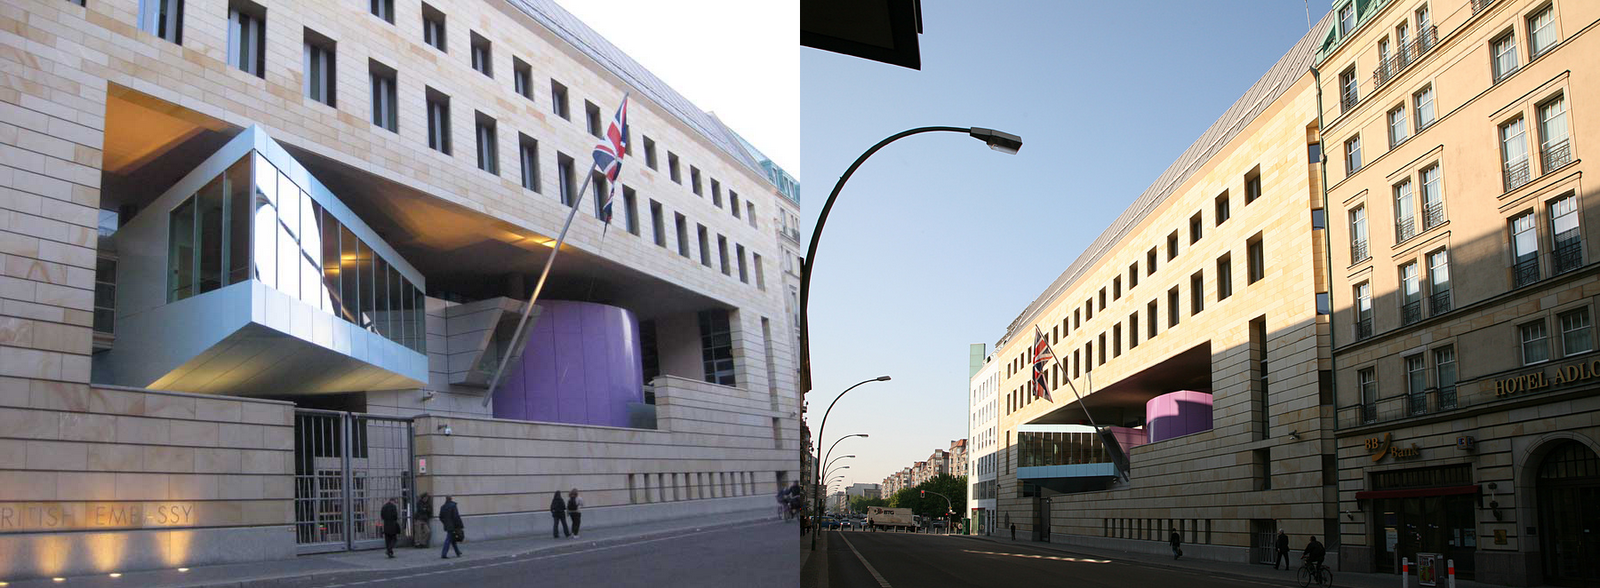 Ambassade d'Italie - Berlin